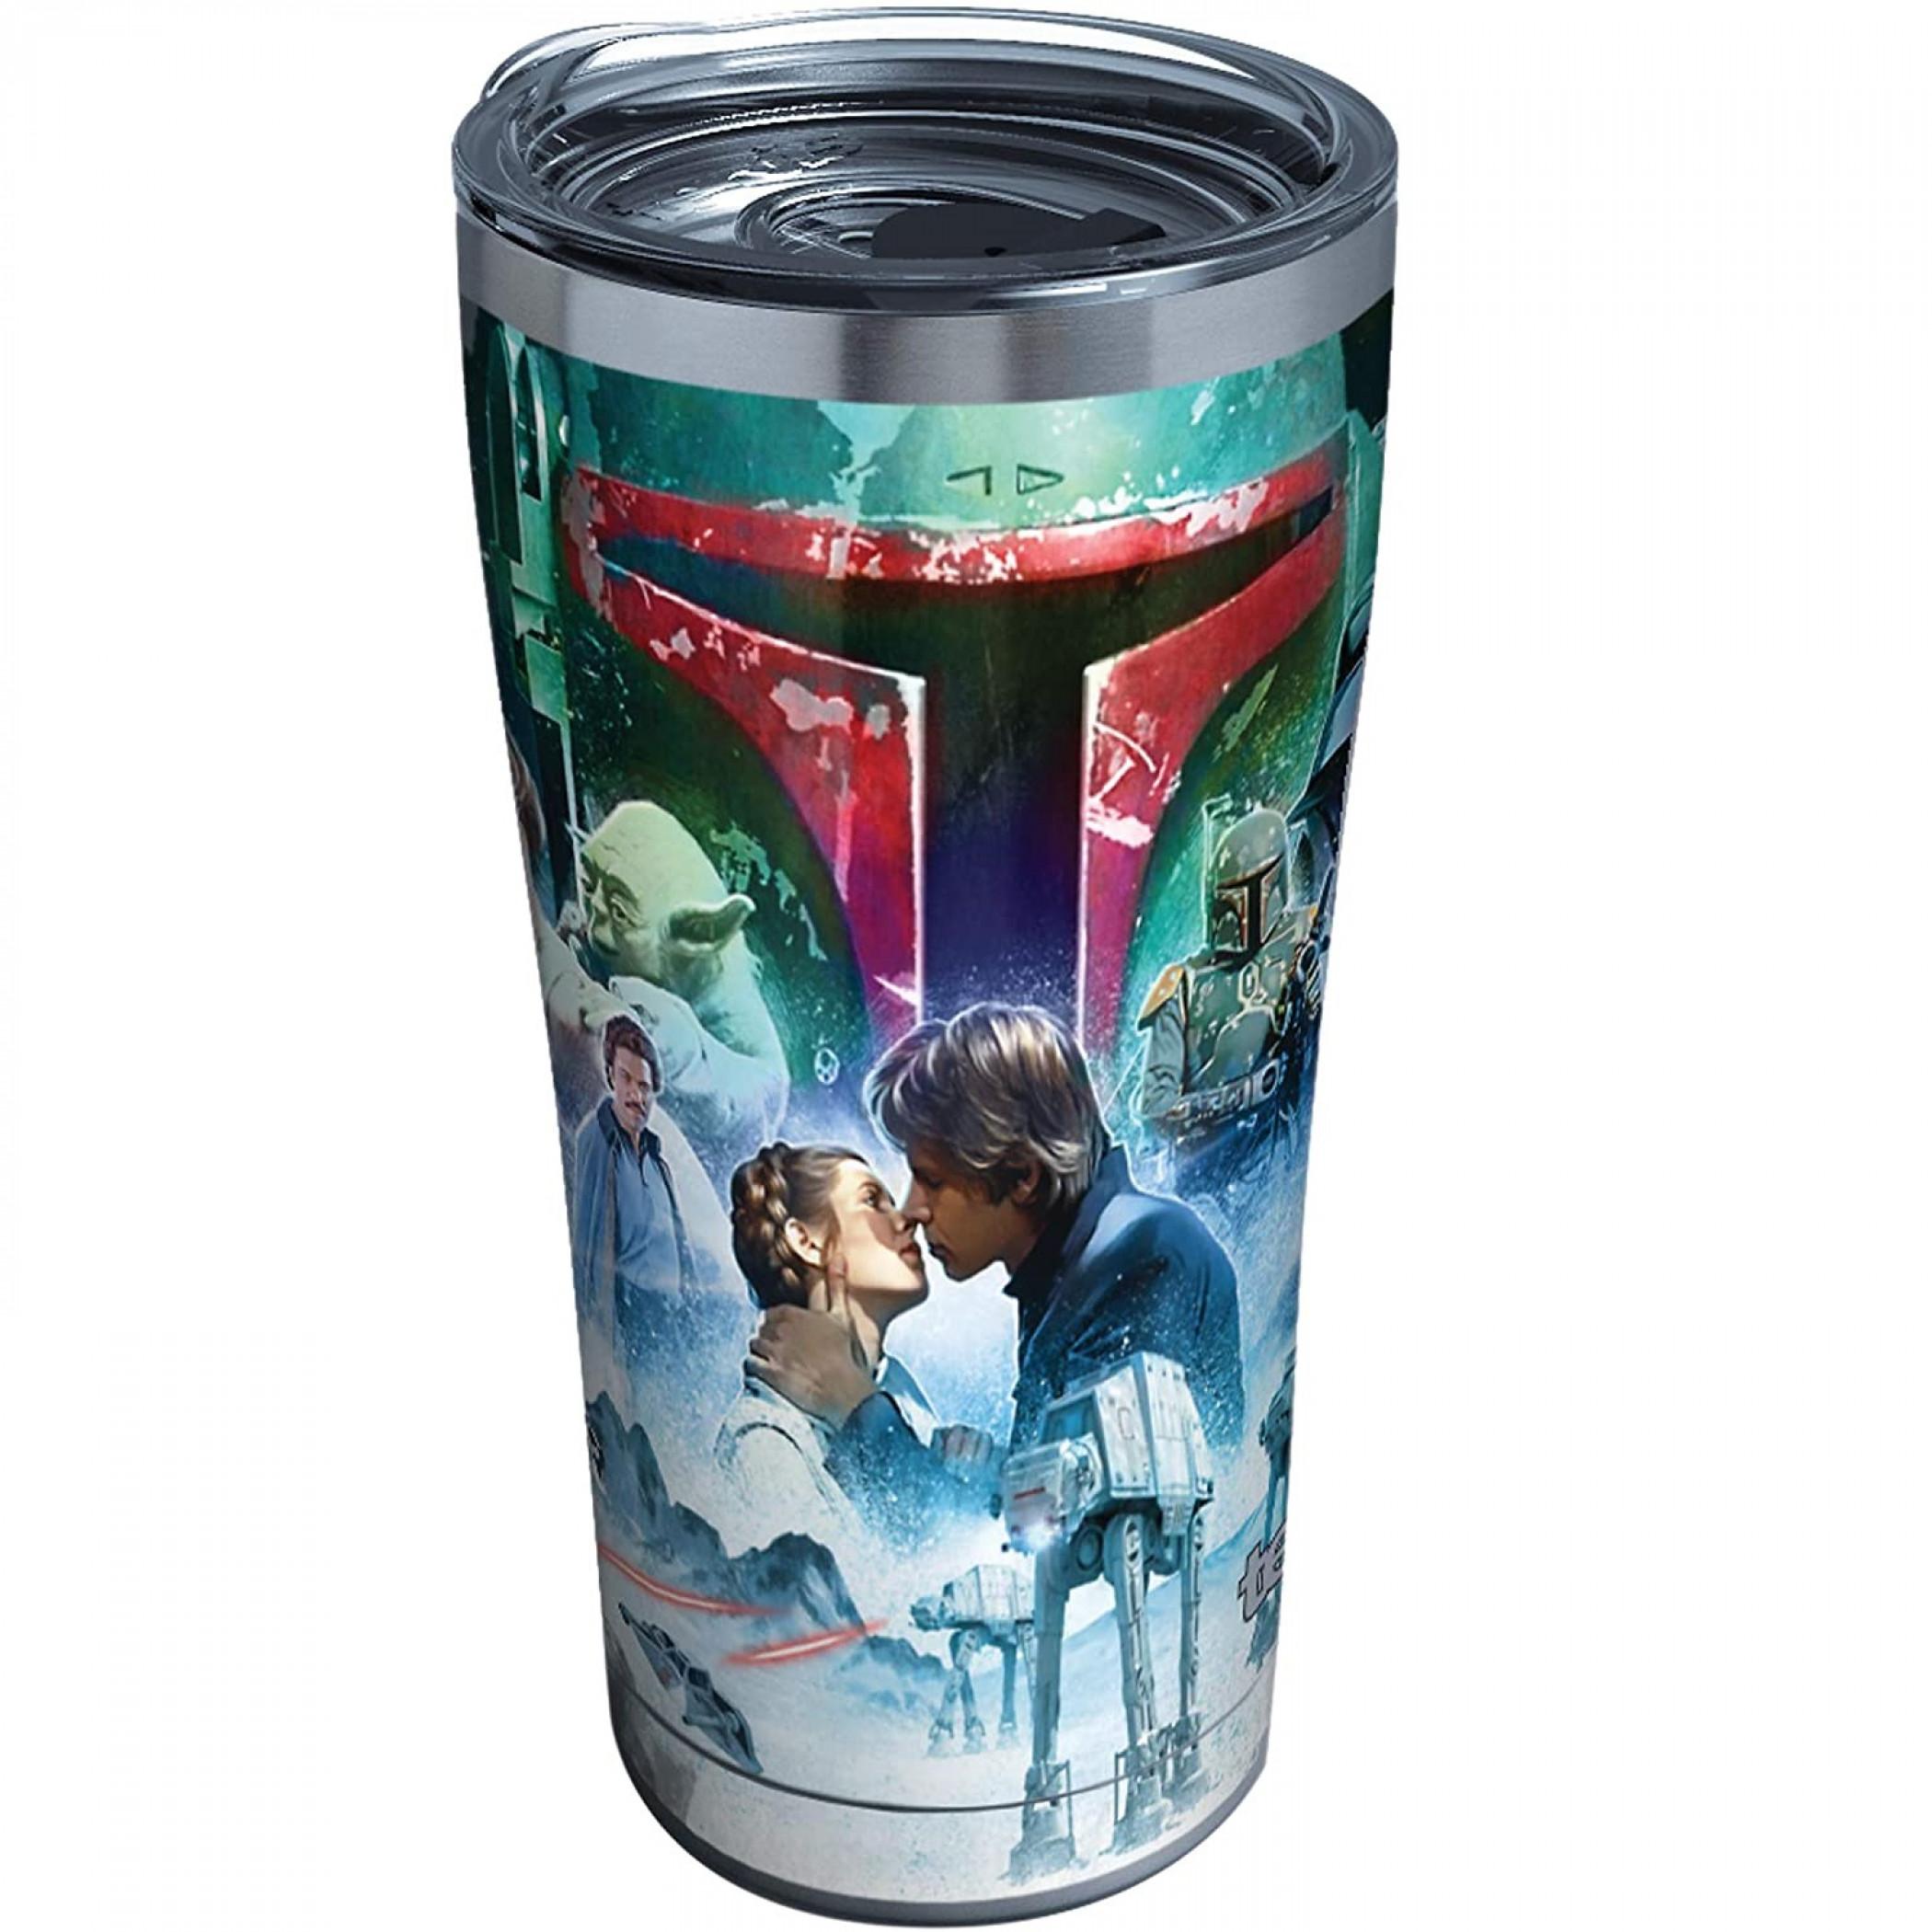 Star Wars Empire Strikes Back 40th Anniversary Collage 20 oz Tumbler